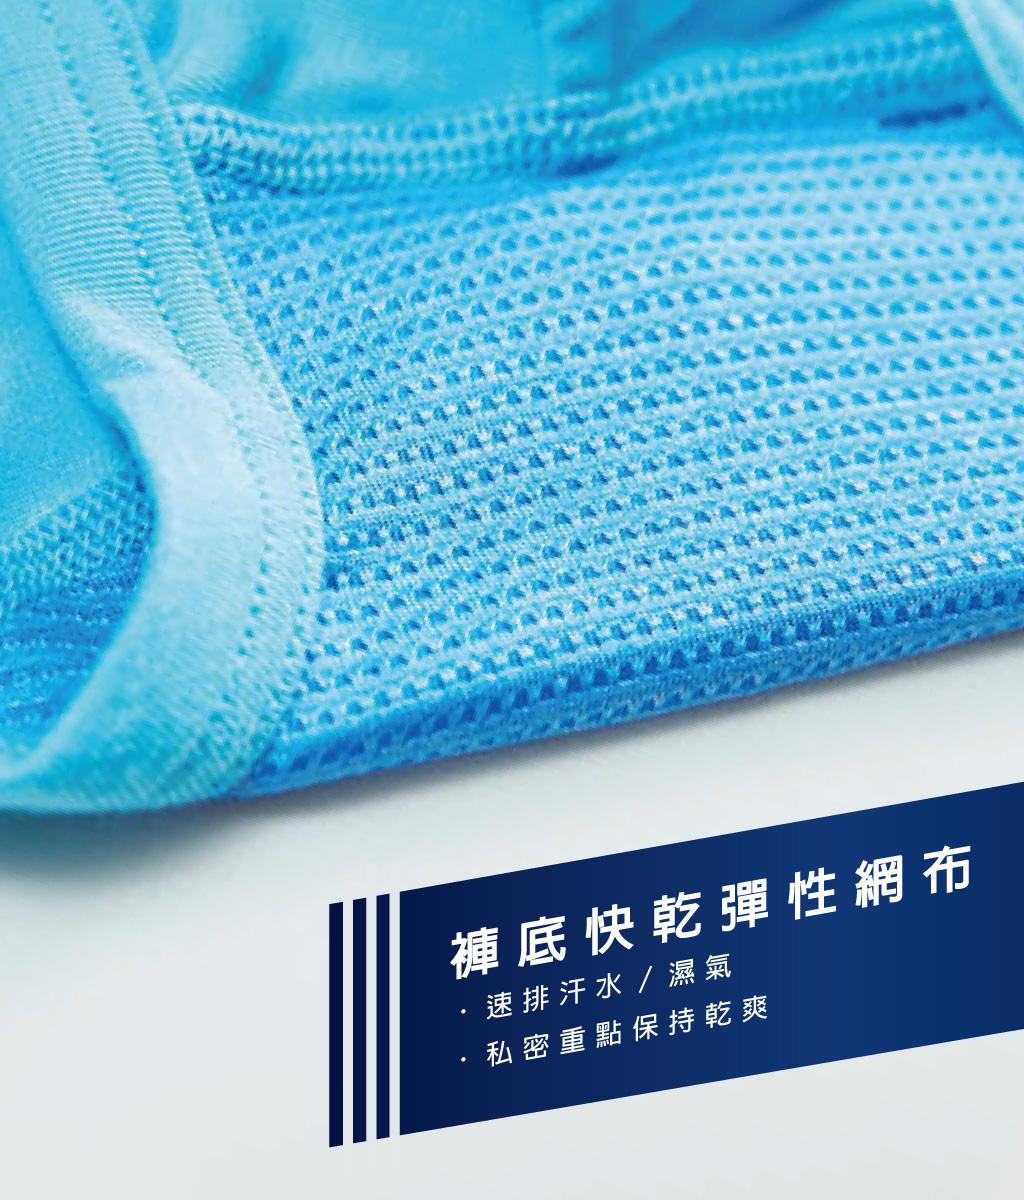 3GUN |男性時尚內衣褲MIT品牌-天翼‧能鍺AIR-透氣網眼男莫代爾棉三角褲